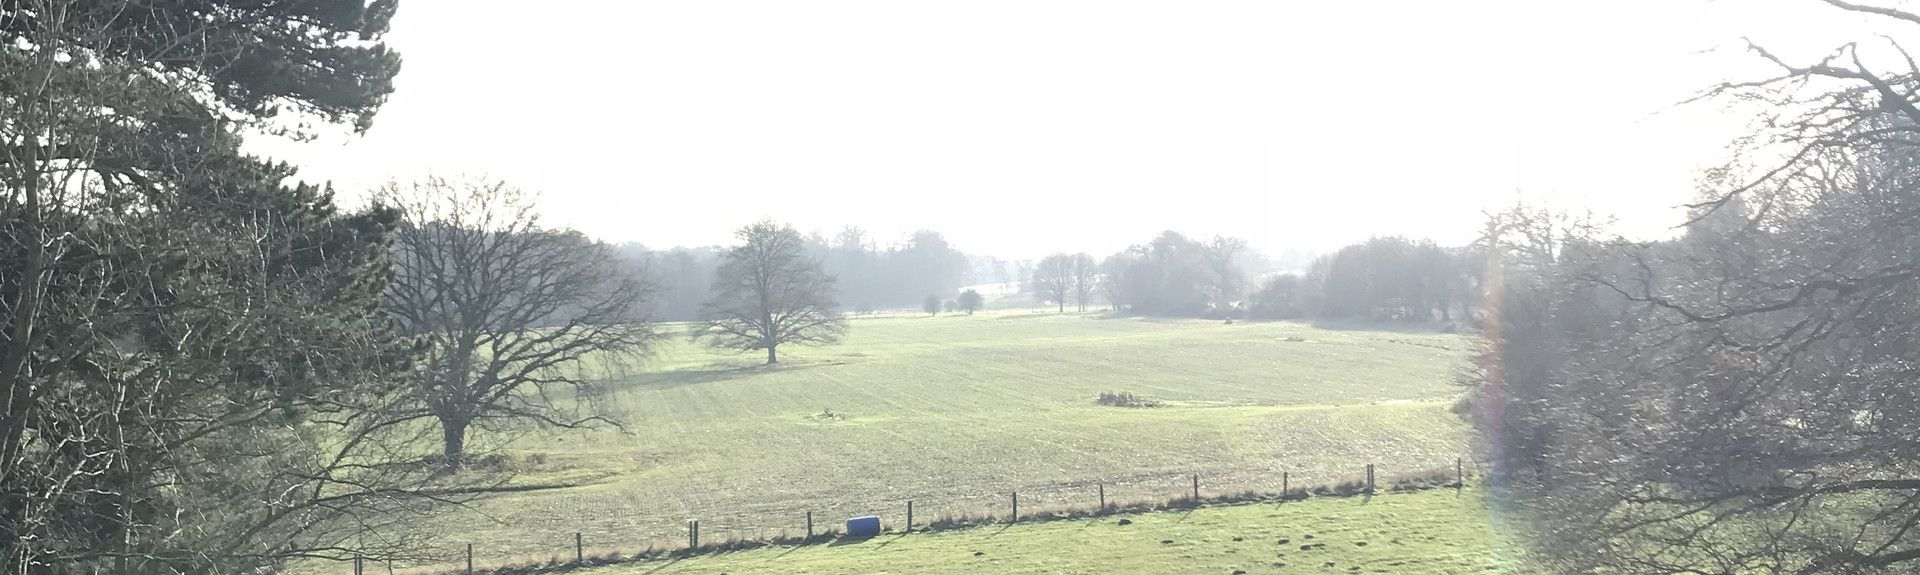 Shere, Surrey, UK